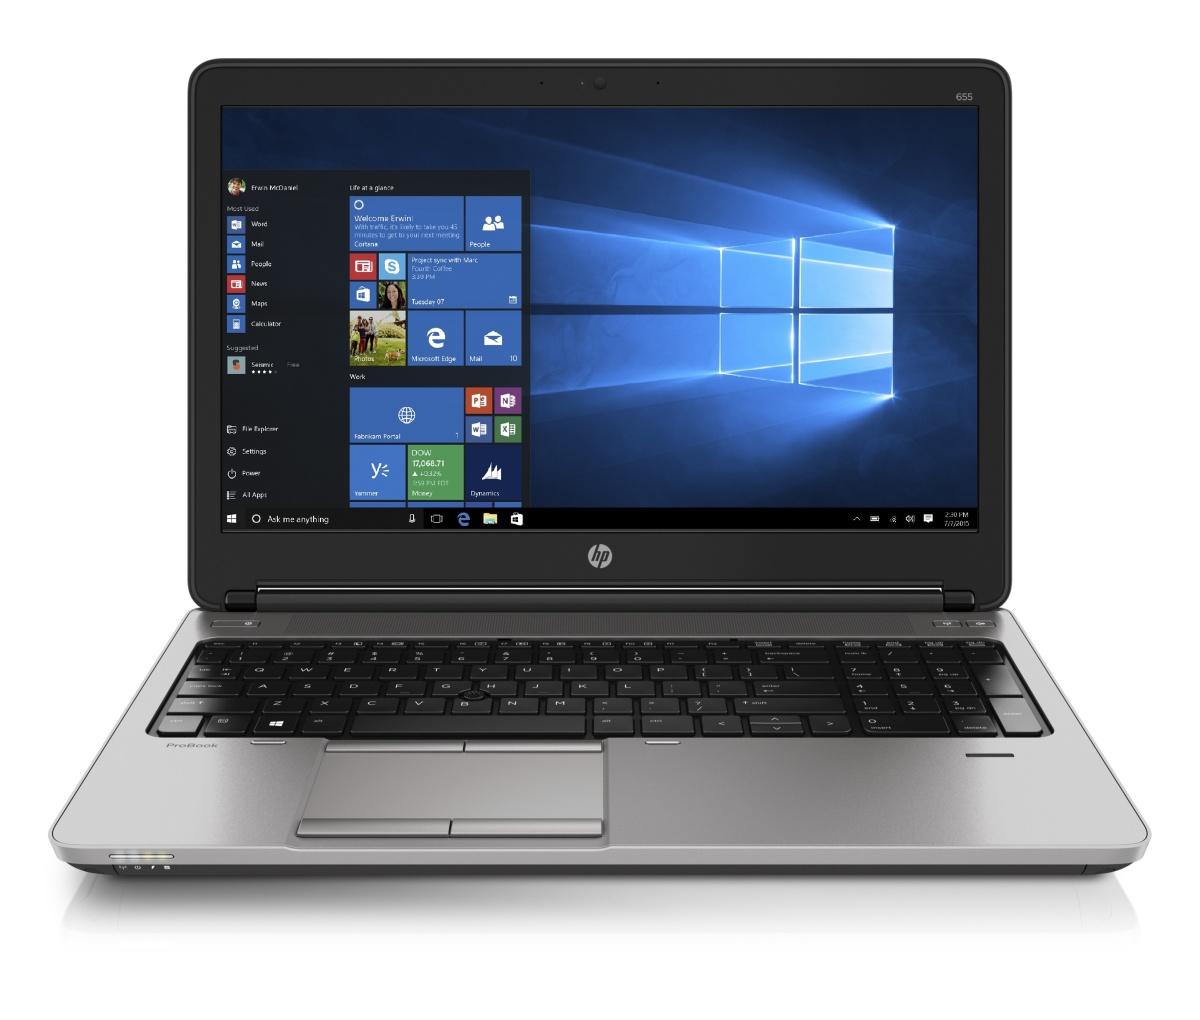 HP ProBook 655 G1 A10-5750M 15,6 FHD AG 8GB 256SSD DVD FPR W7P+W8.1P